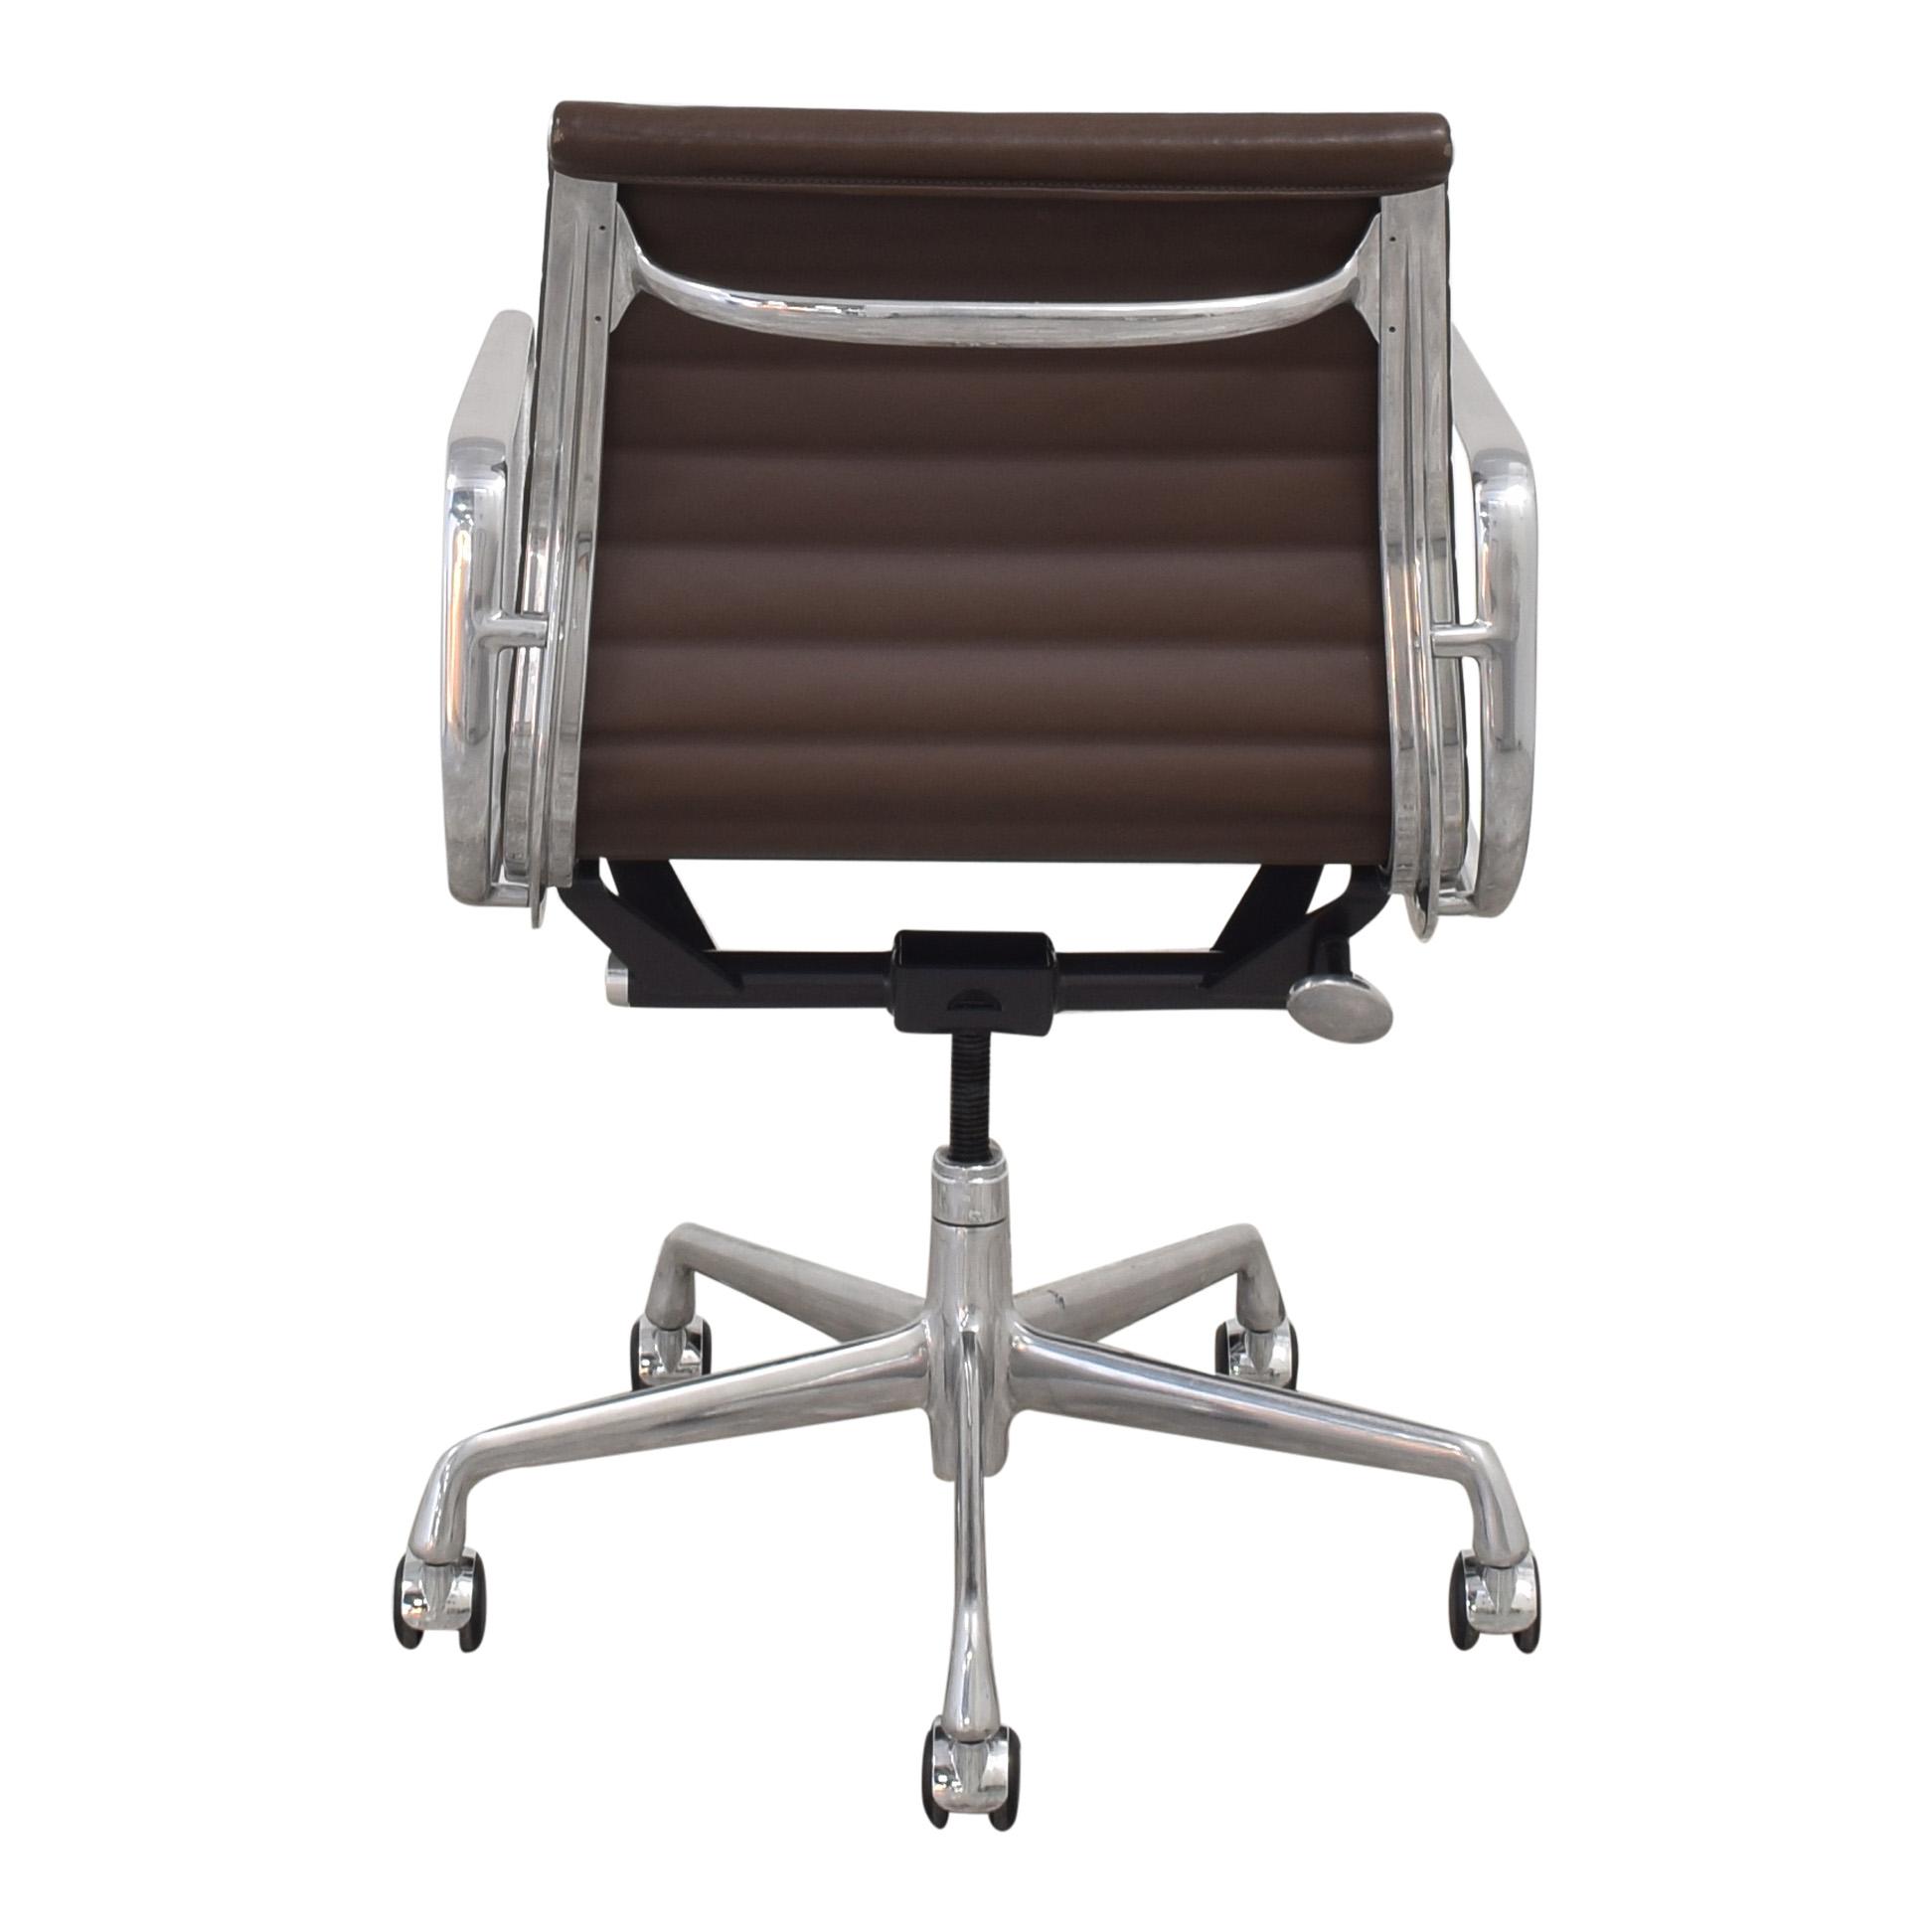 Herman Miller Herman Miller Eames Aluminum Group Management Chair brown & silver